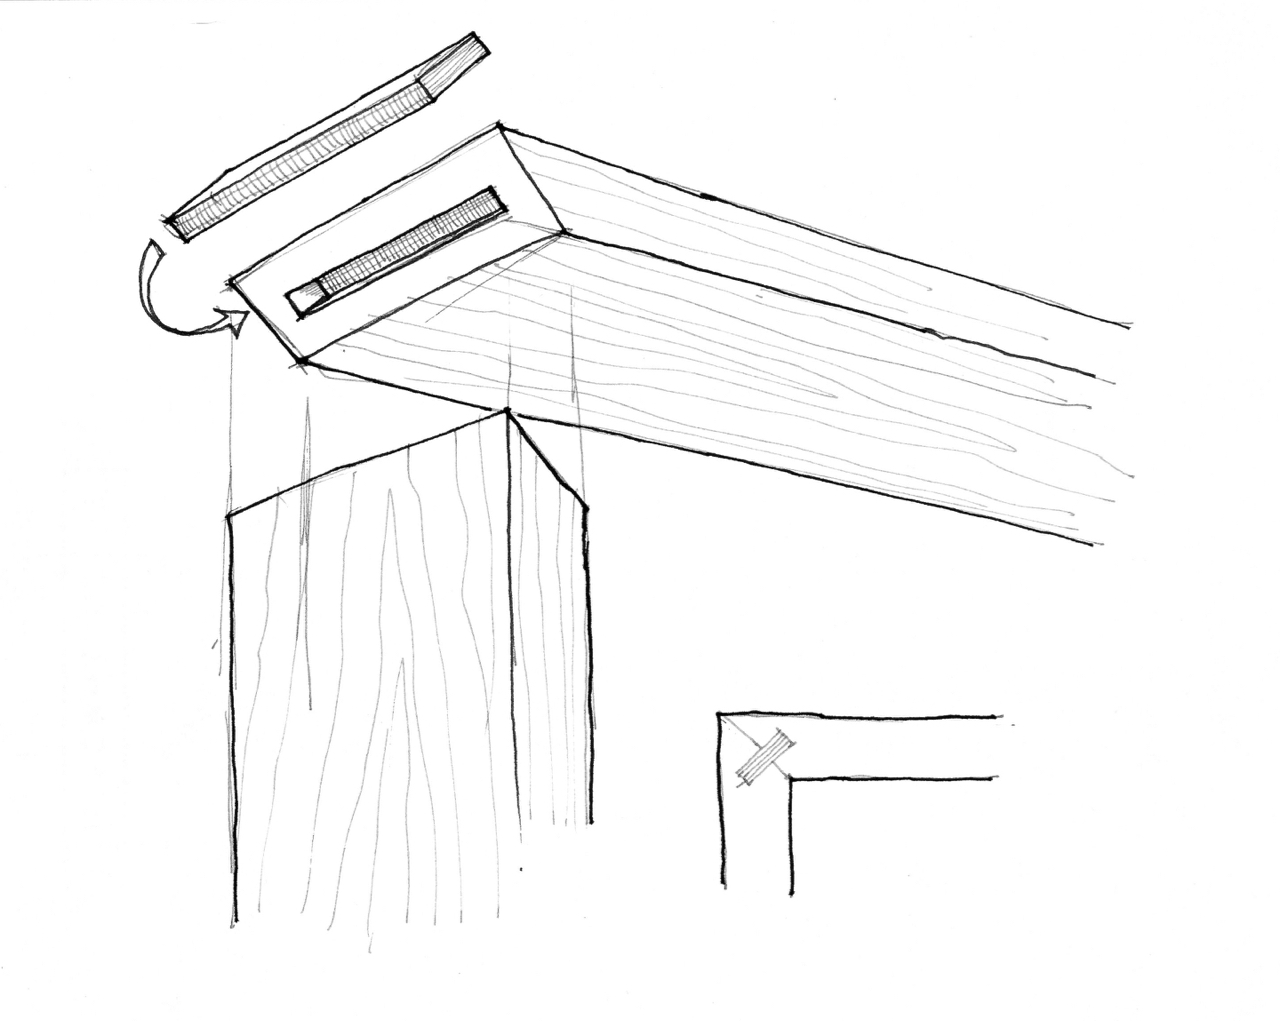 Plywood spline